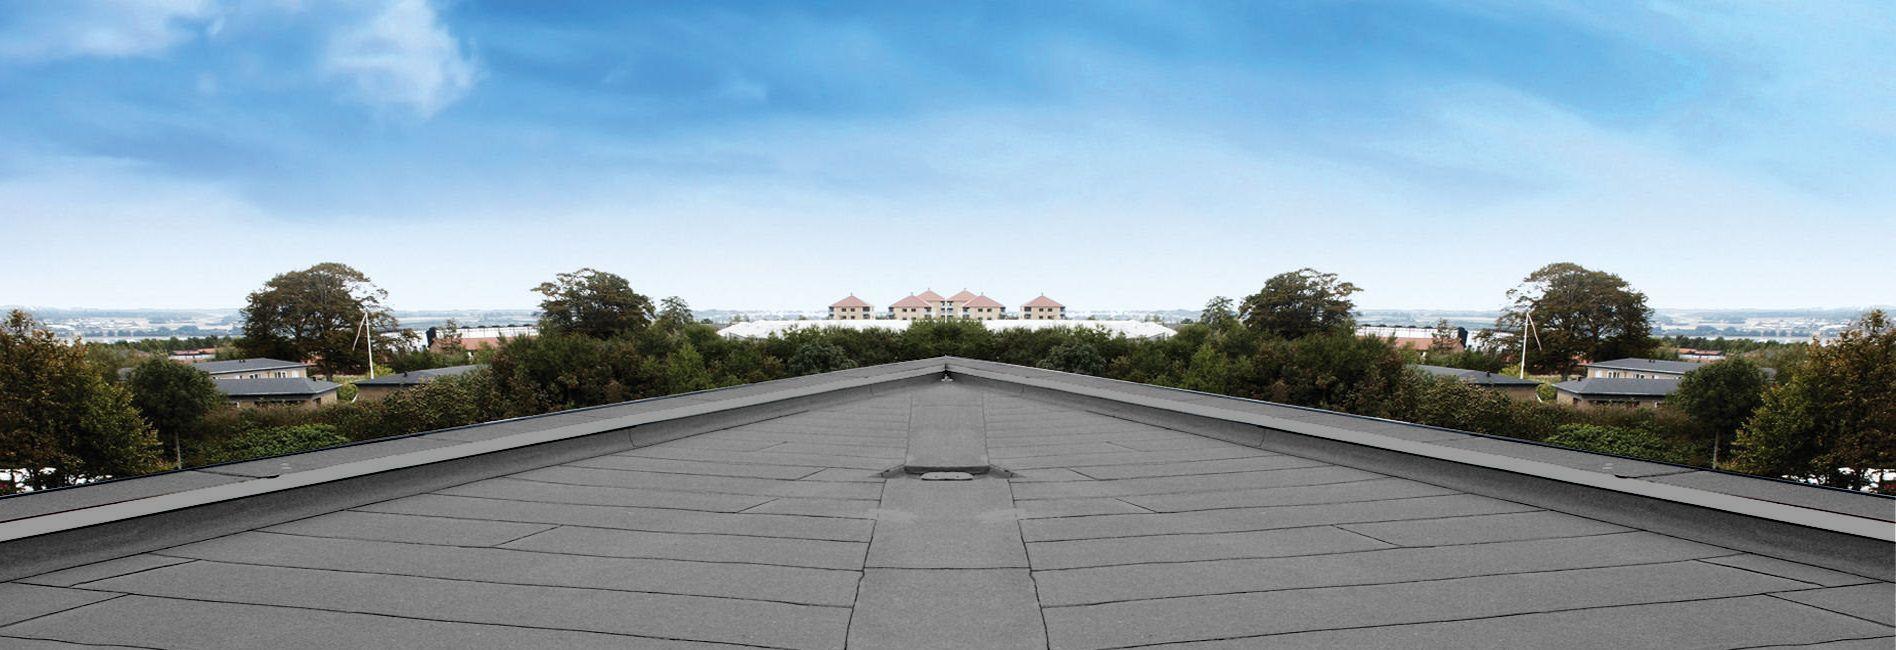 Шапка плоская крыша